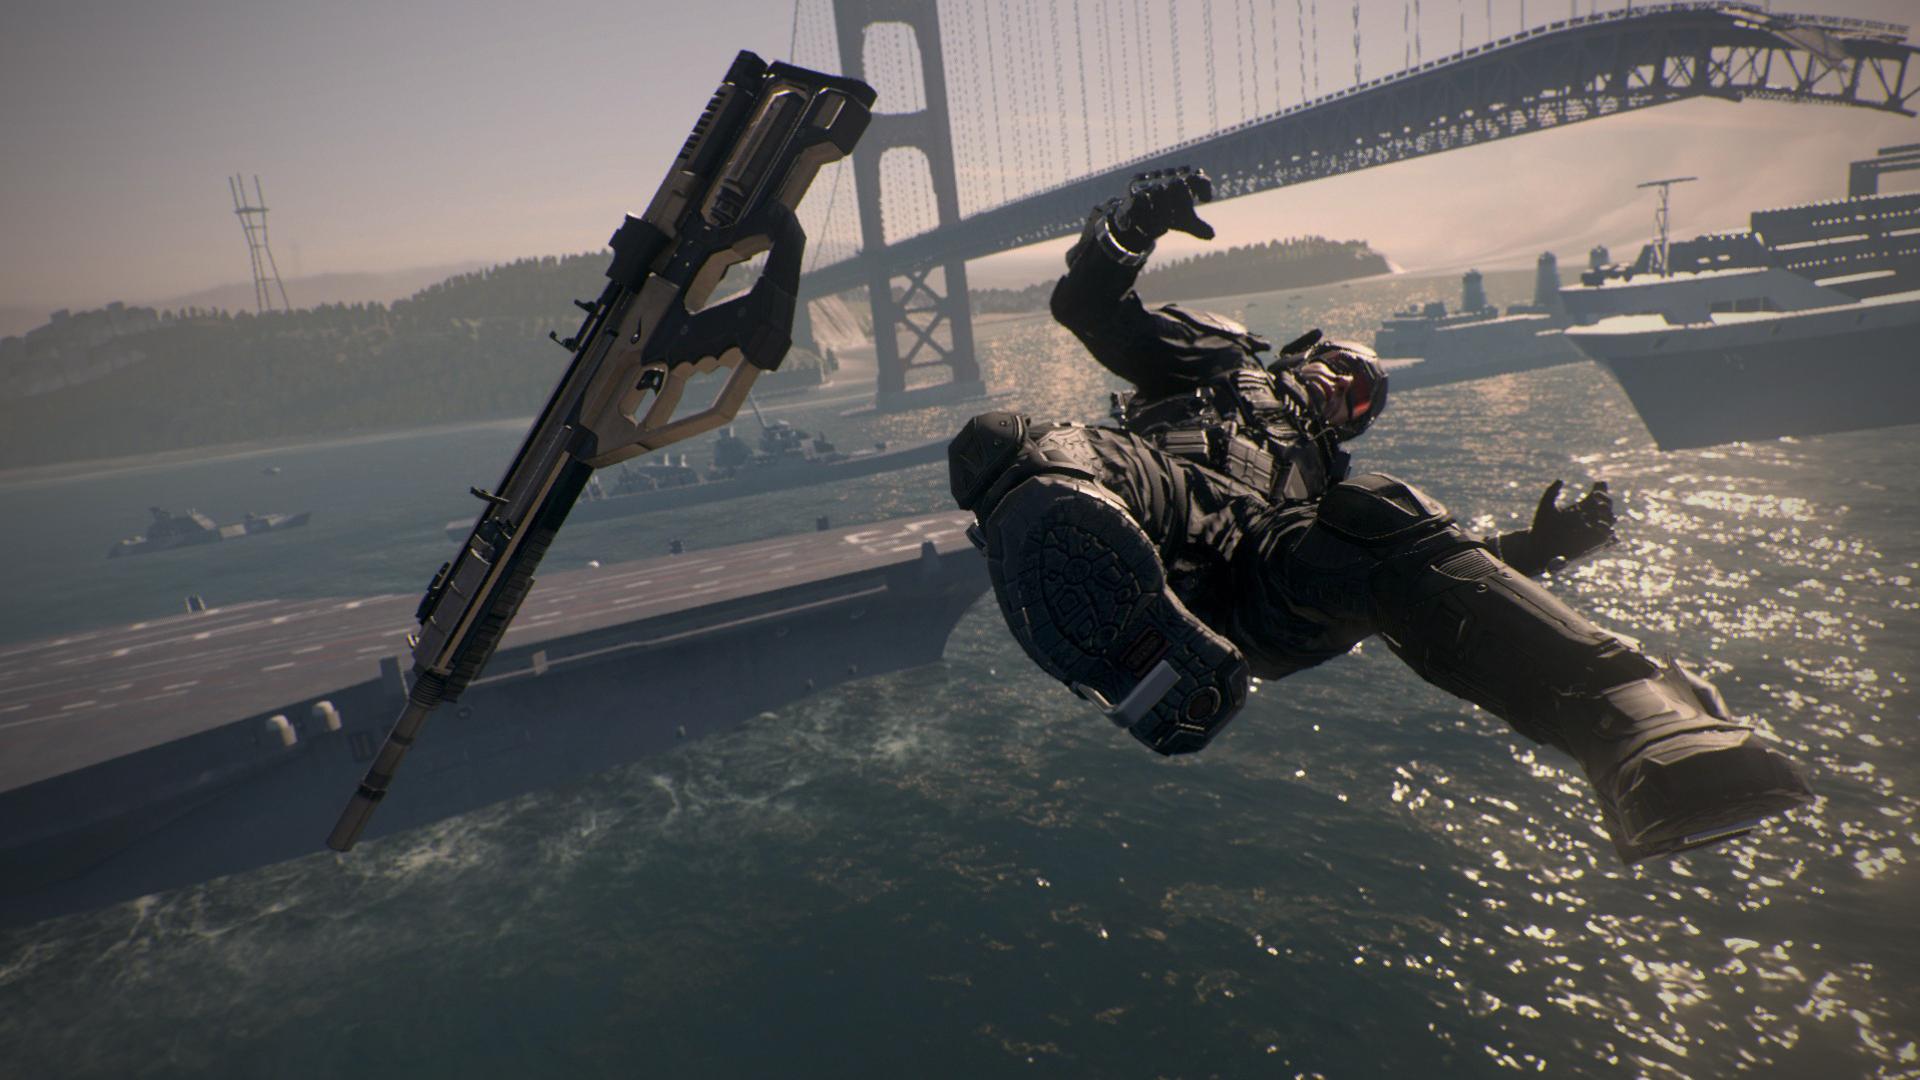 Man Overboard! Achievement in Call of Duty: Advanced Warfare